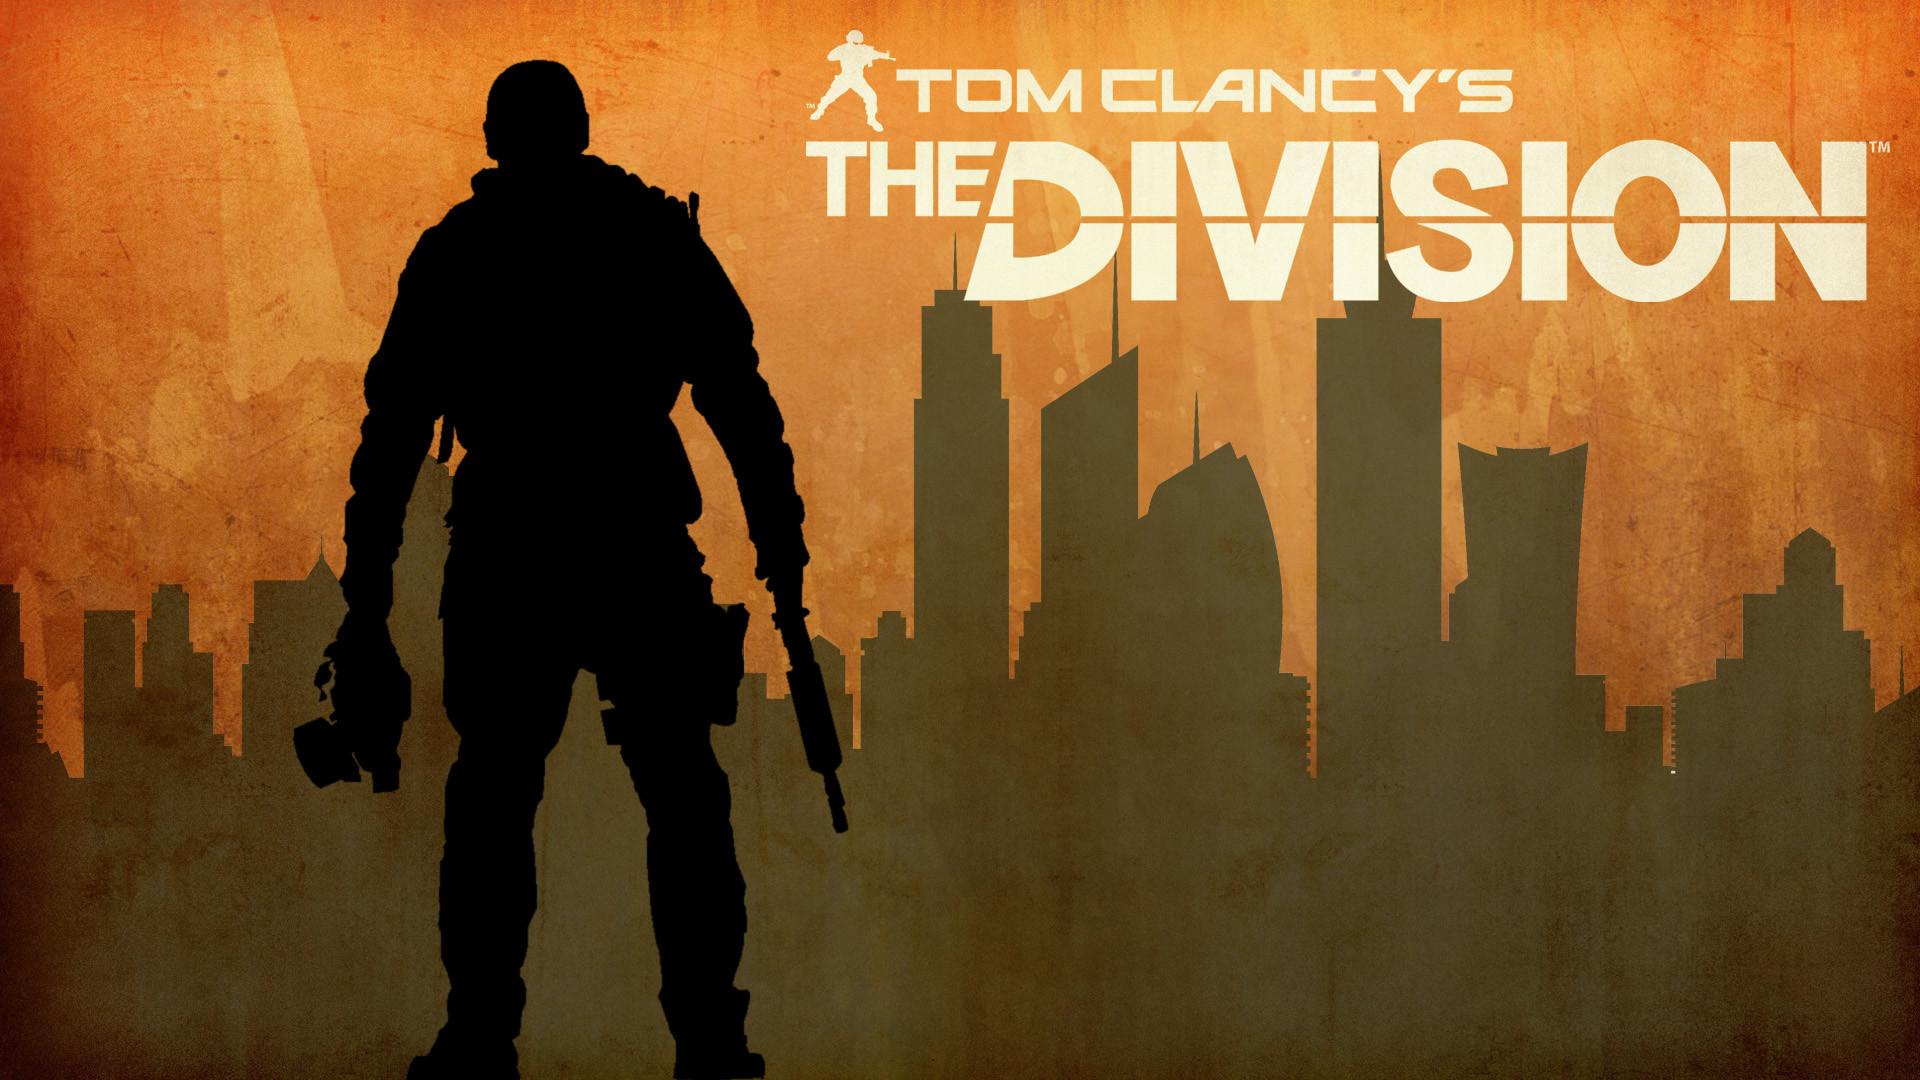 Community Intelligence Tom Clancys the Division Wallpaper HD 1920×1080 Tom  Clancy's The Division Wallpapers